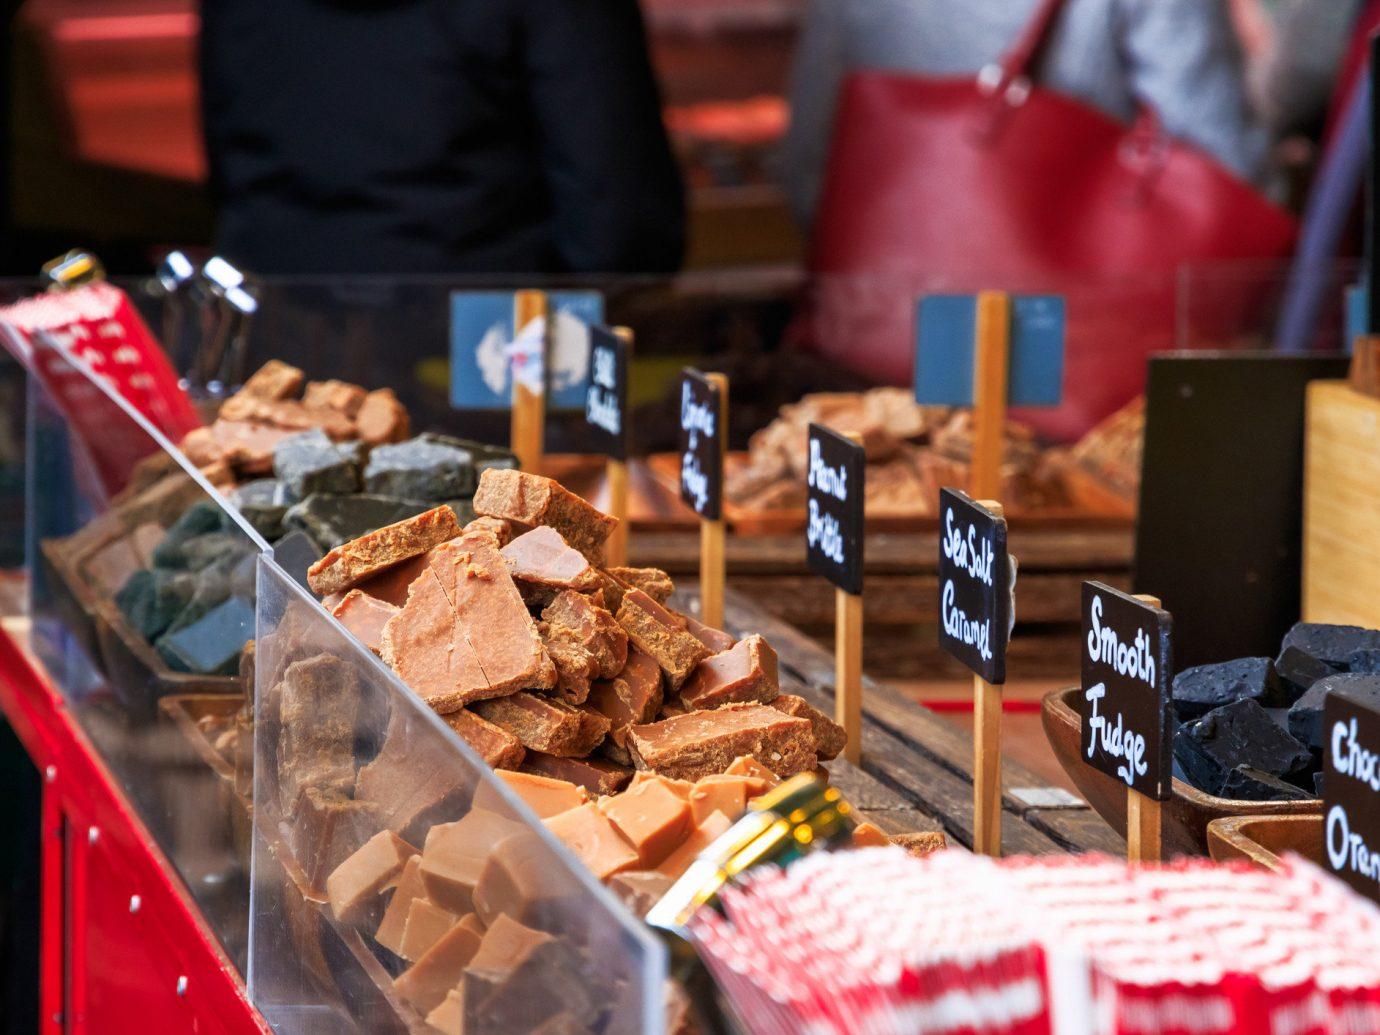 Budget Food + Drink table indoor red City public space food market vendor fair dessert sense